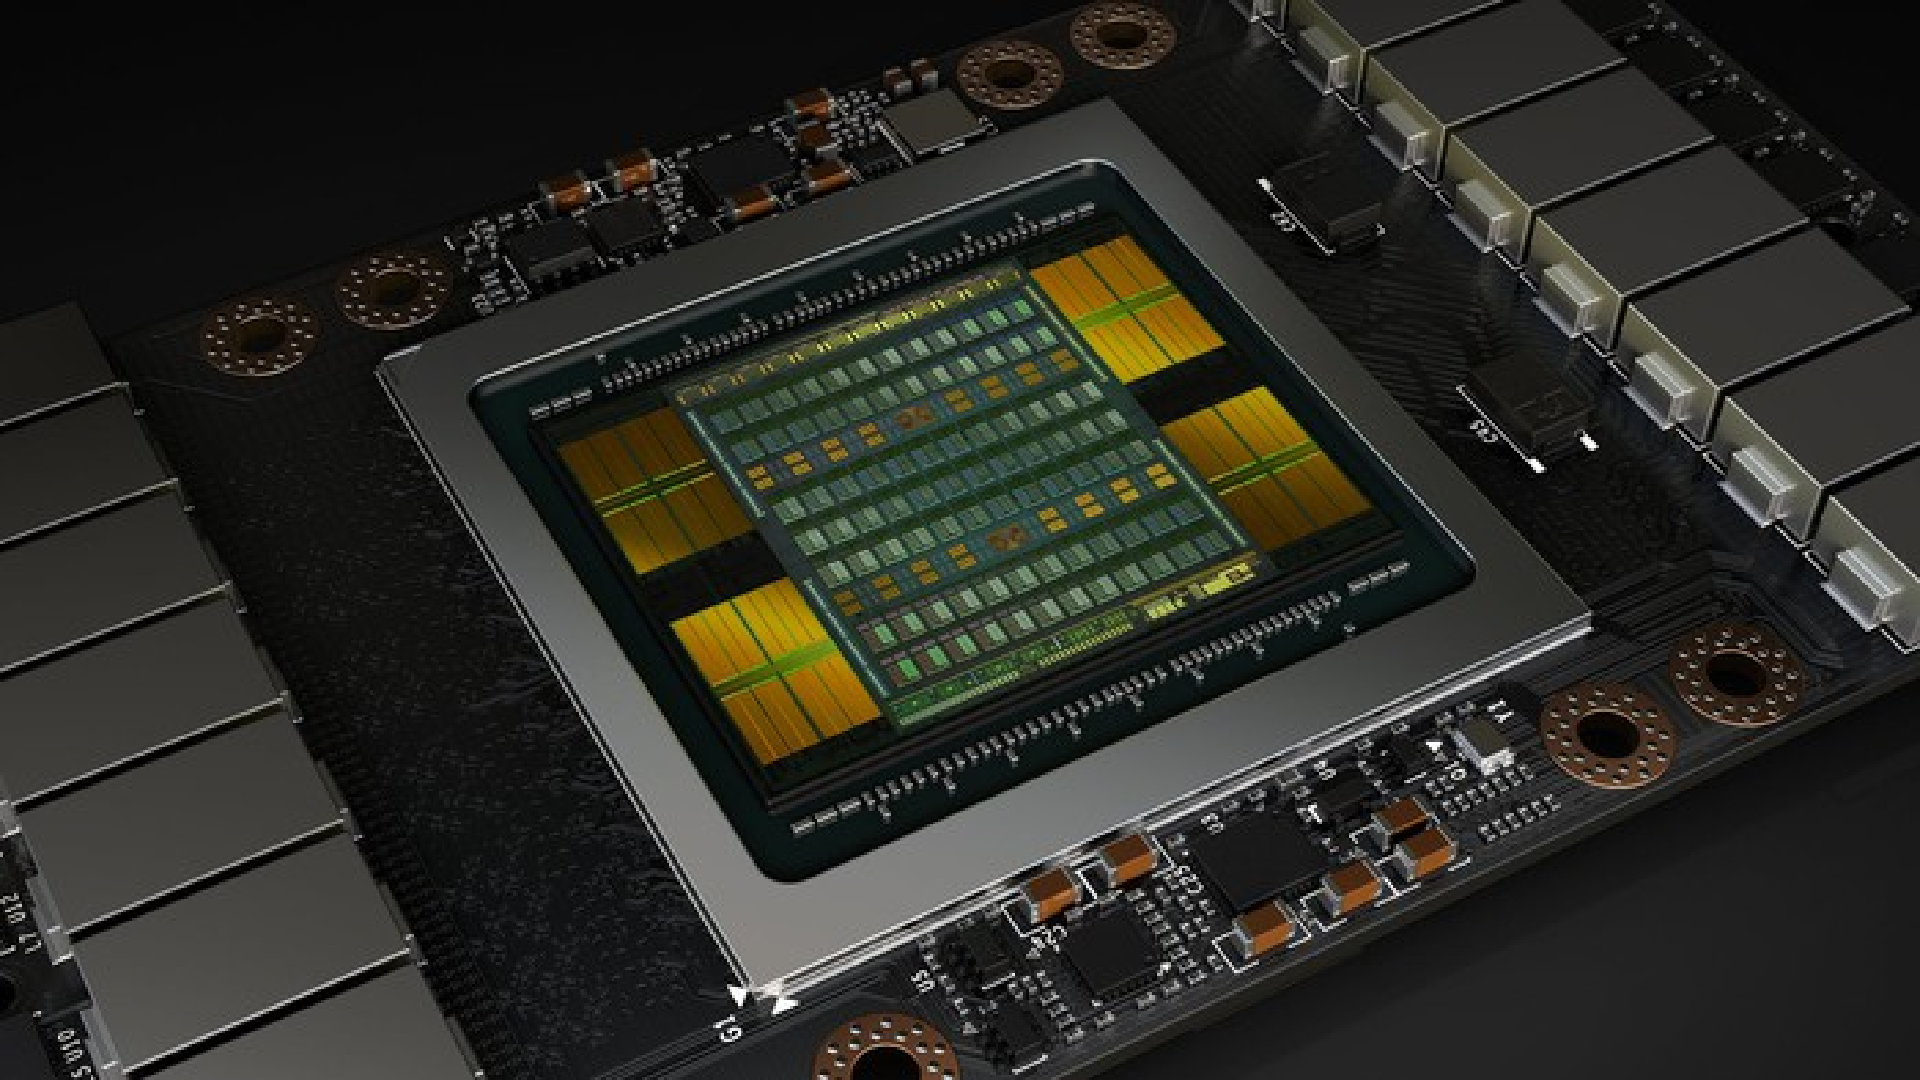 The Tesla V100 GPU.